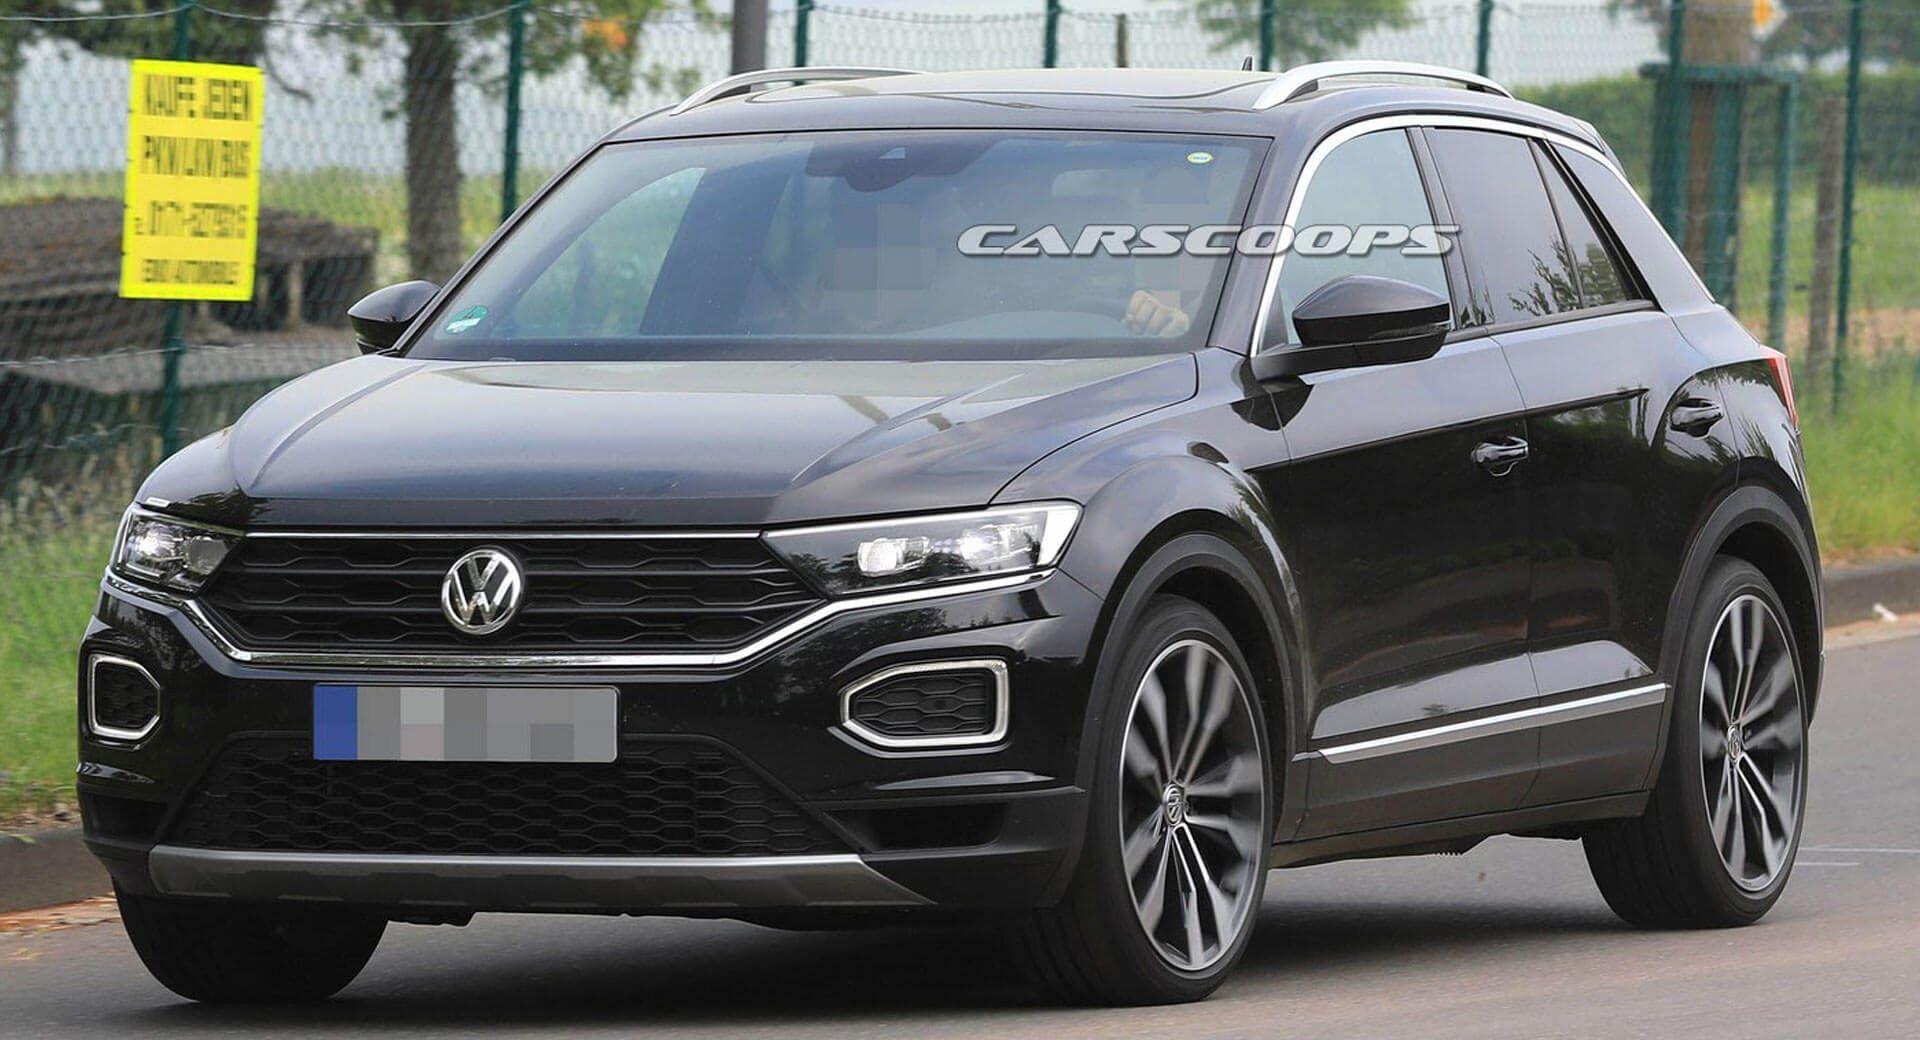 Vw T Roc R Looks Like A 305 Hp Sleeper In Latest Spy Photos Carscoops Roc Vw Volkswagen Volkswagen